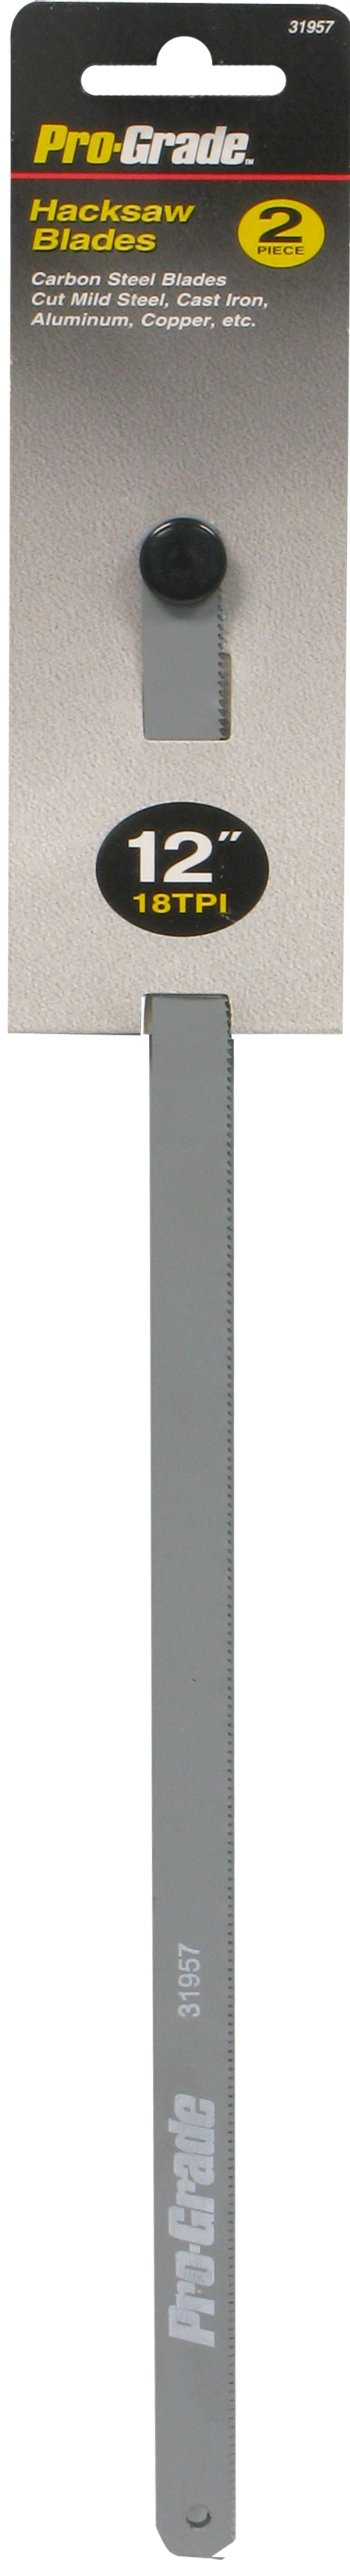 Pro-Grade 31957 12-Inch/18 TPI  Carbon Hacksaw Blade